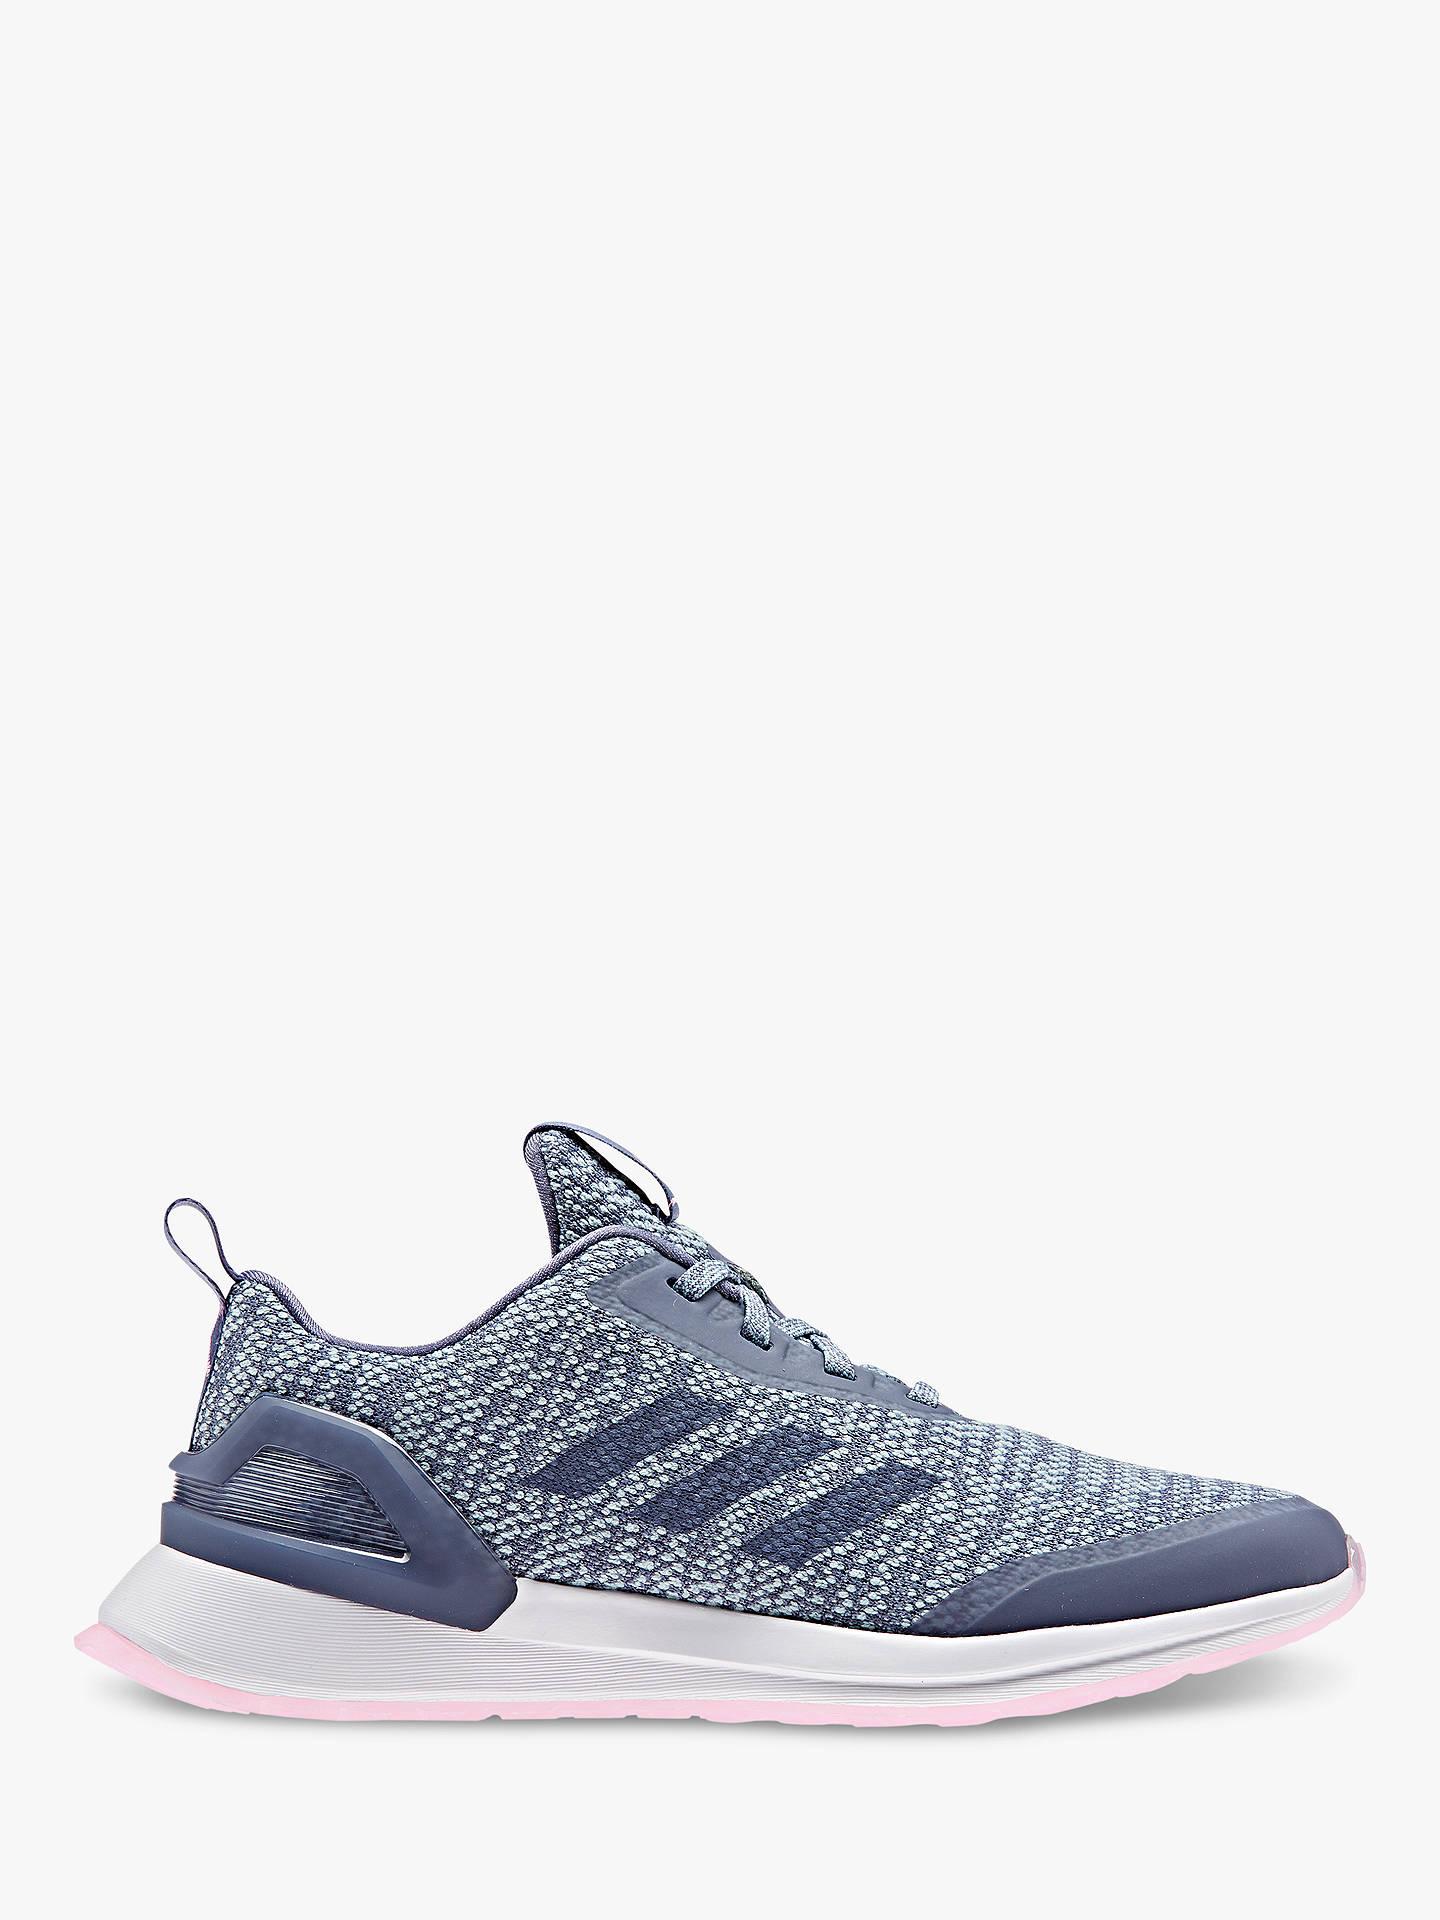 d26e71b0145c Buy adidas Children s RapidaRun X Knit Trainers